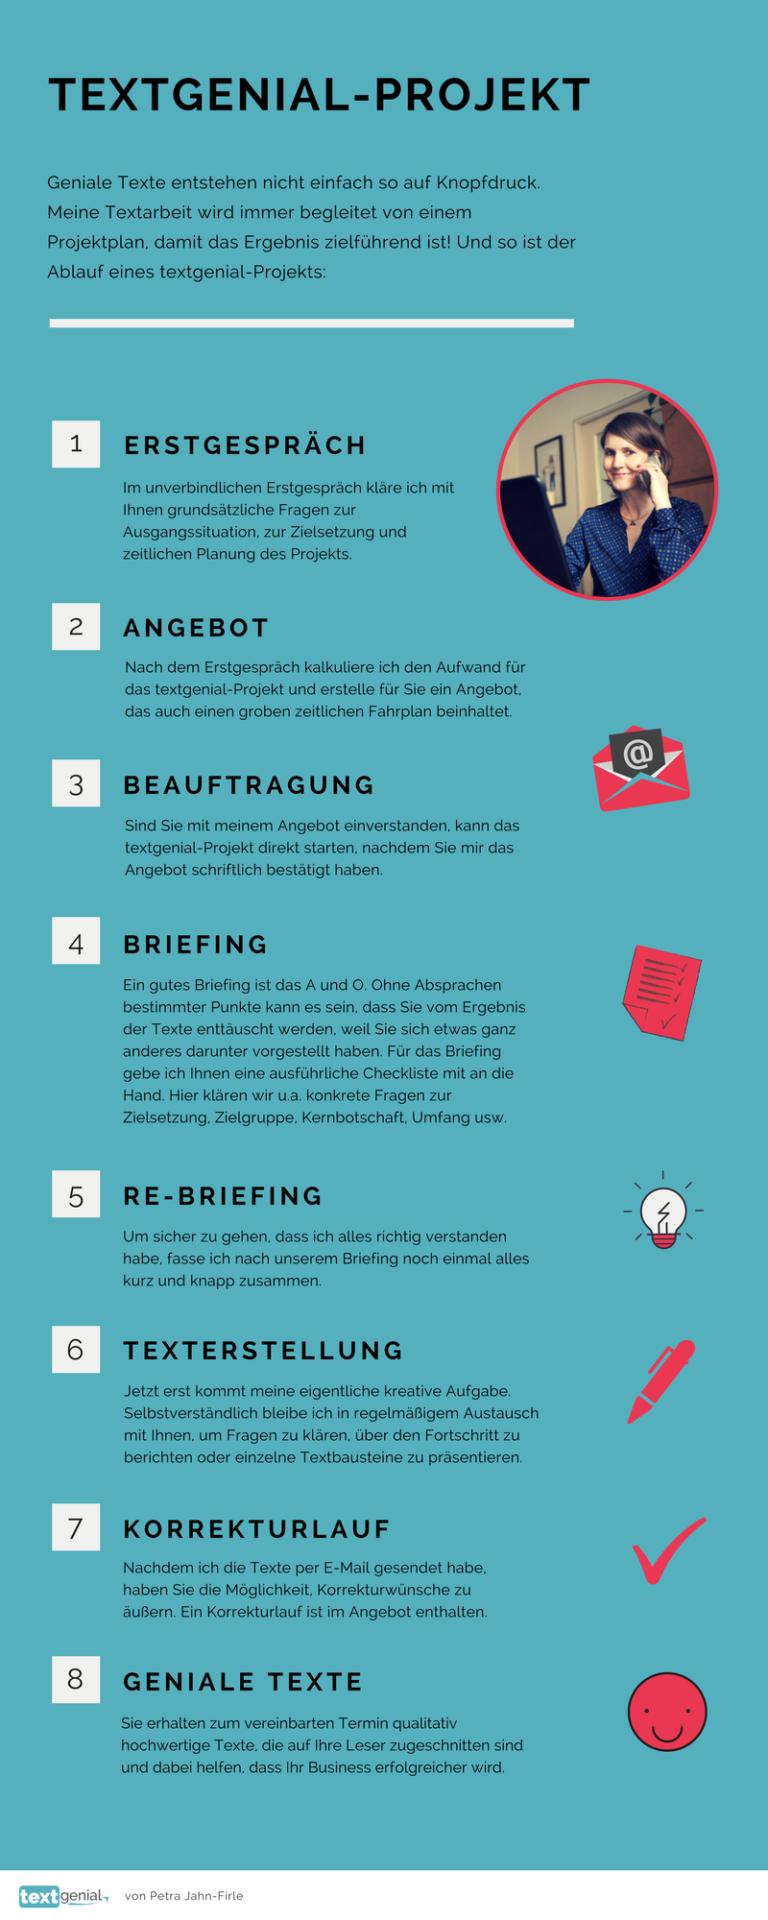 Infografik: Ablauf eines textgenial-Projekts